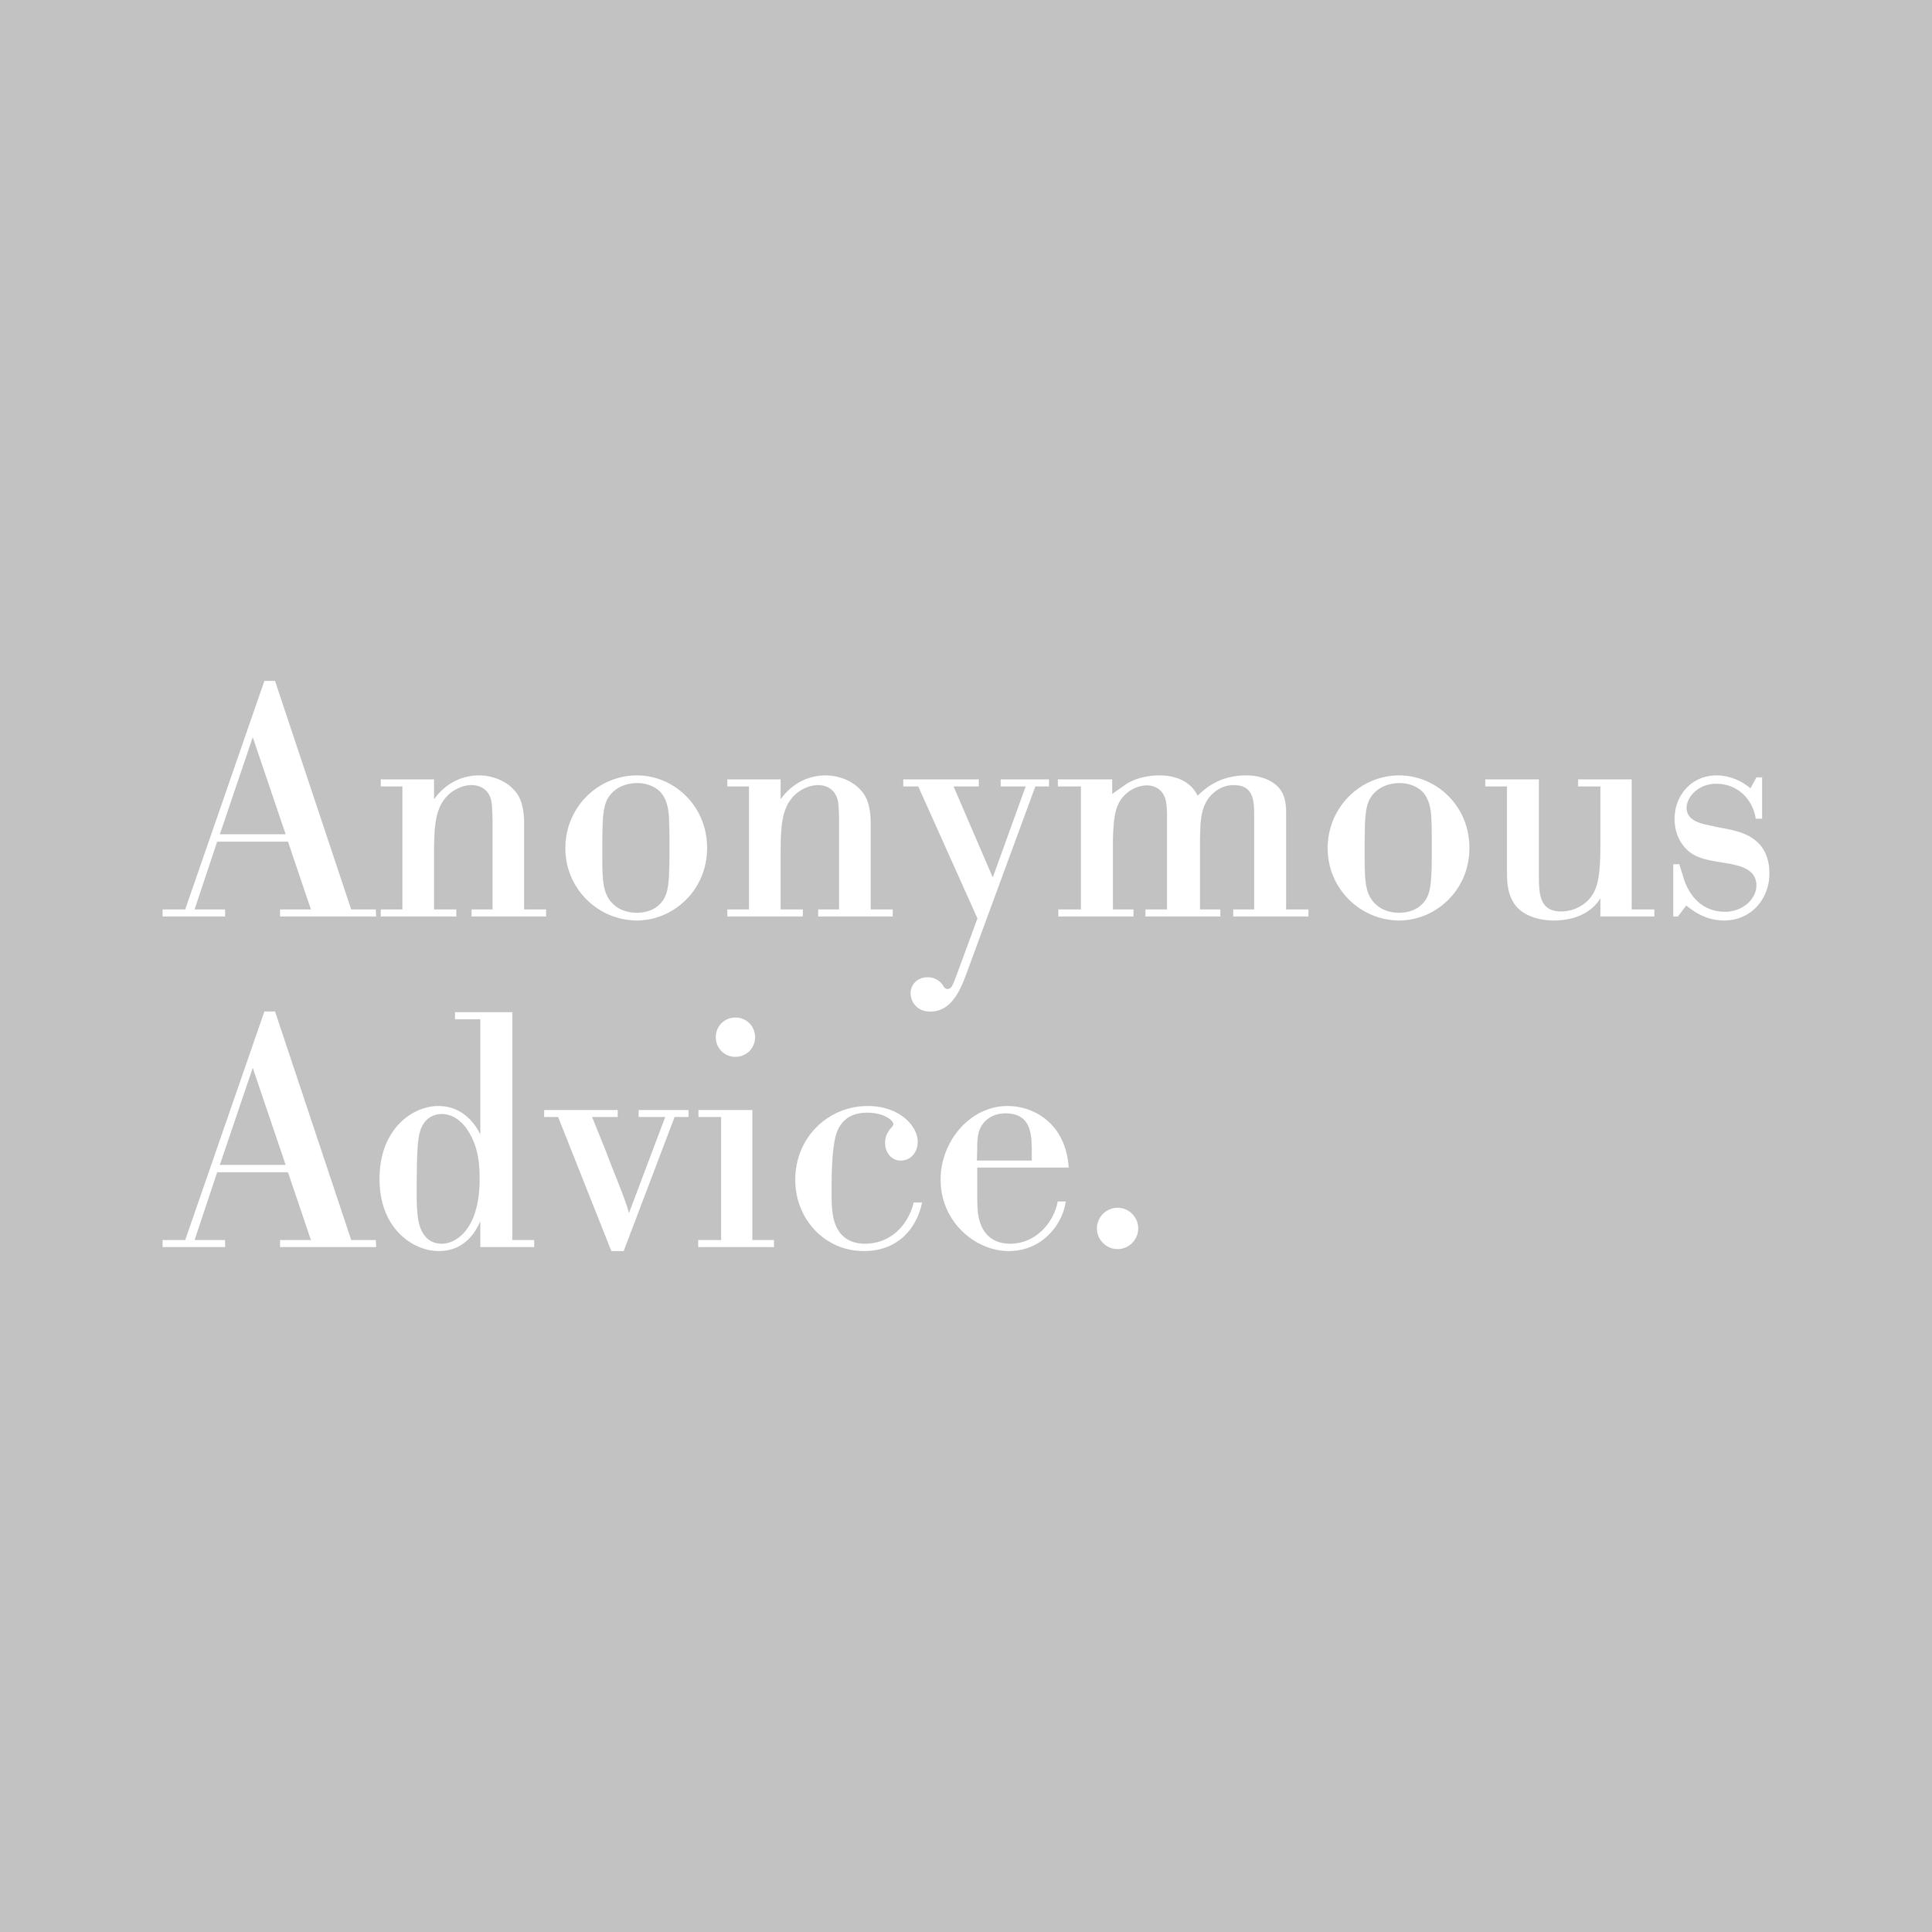 IG-anonymousadvice-icon.png